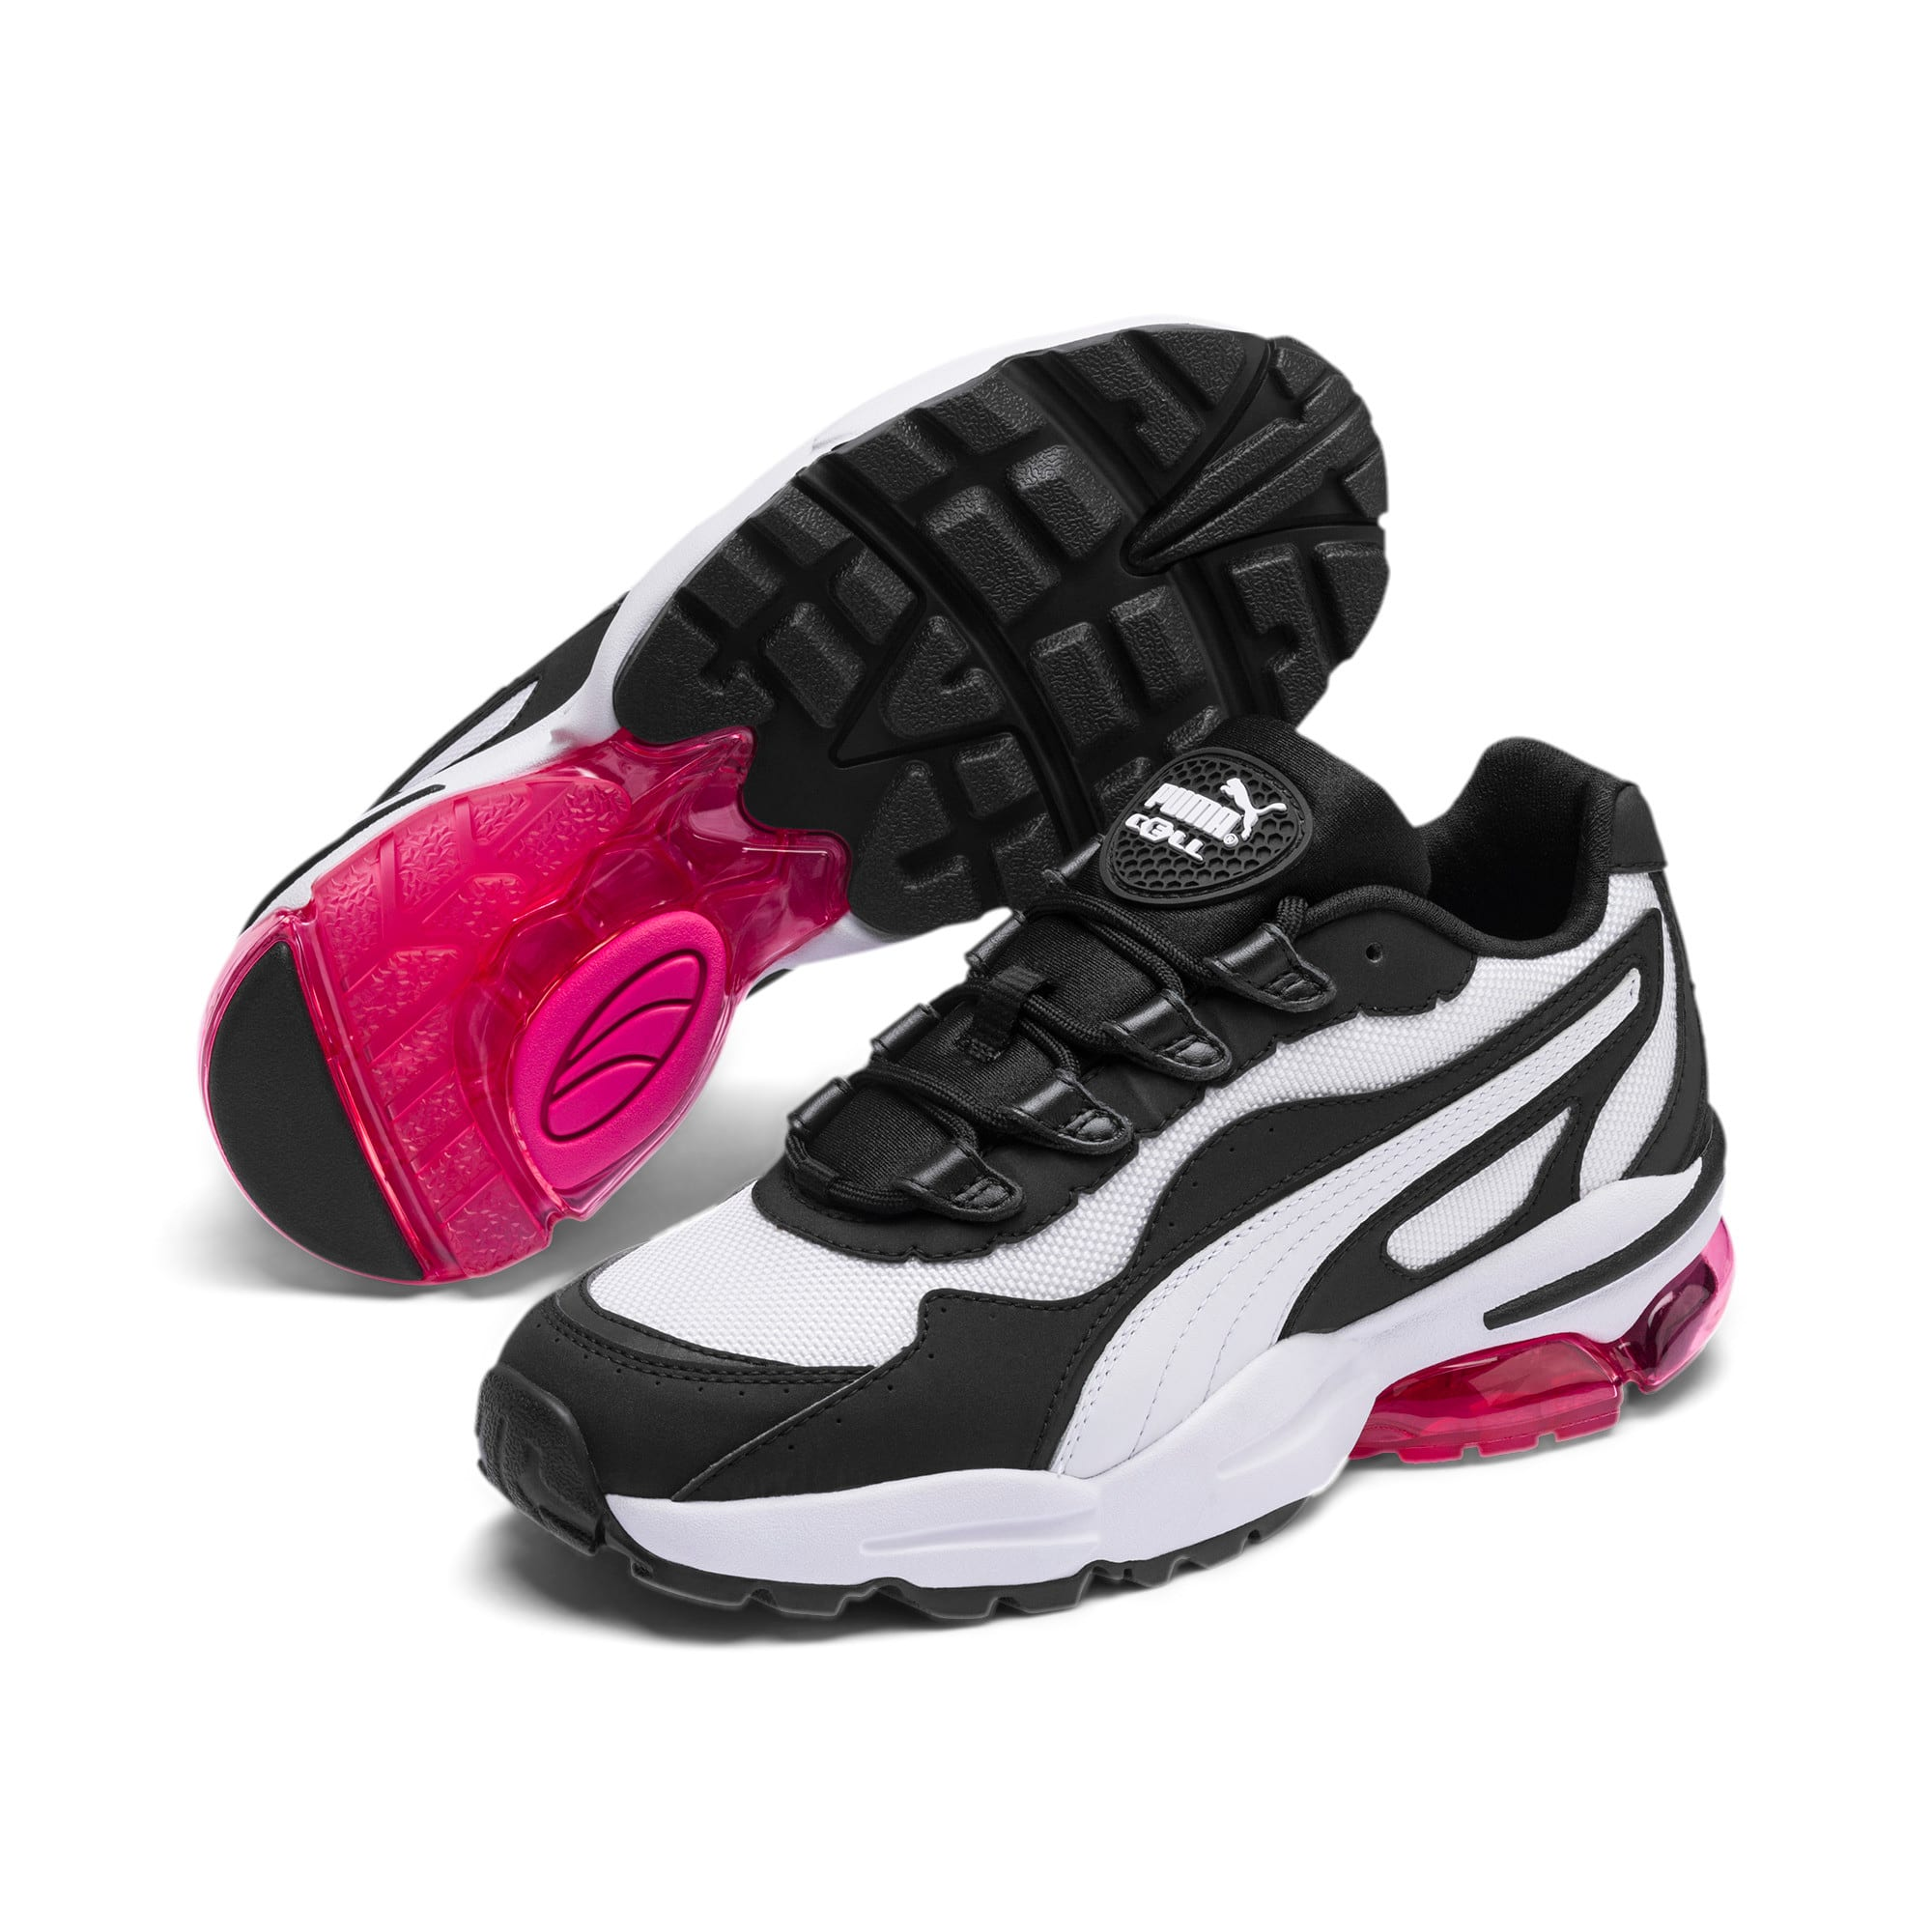 Thumbnail 2 of CELL Stellar Women's Sneakers, Puma White-Puma Black, medium